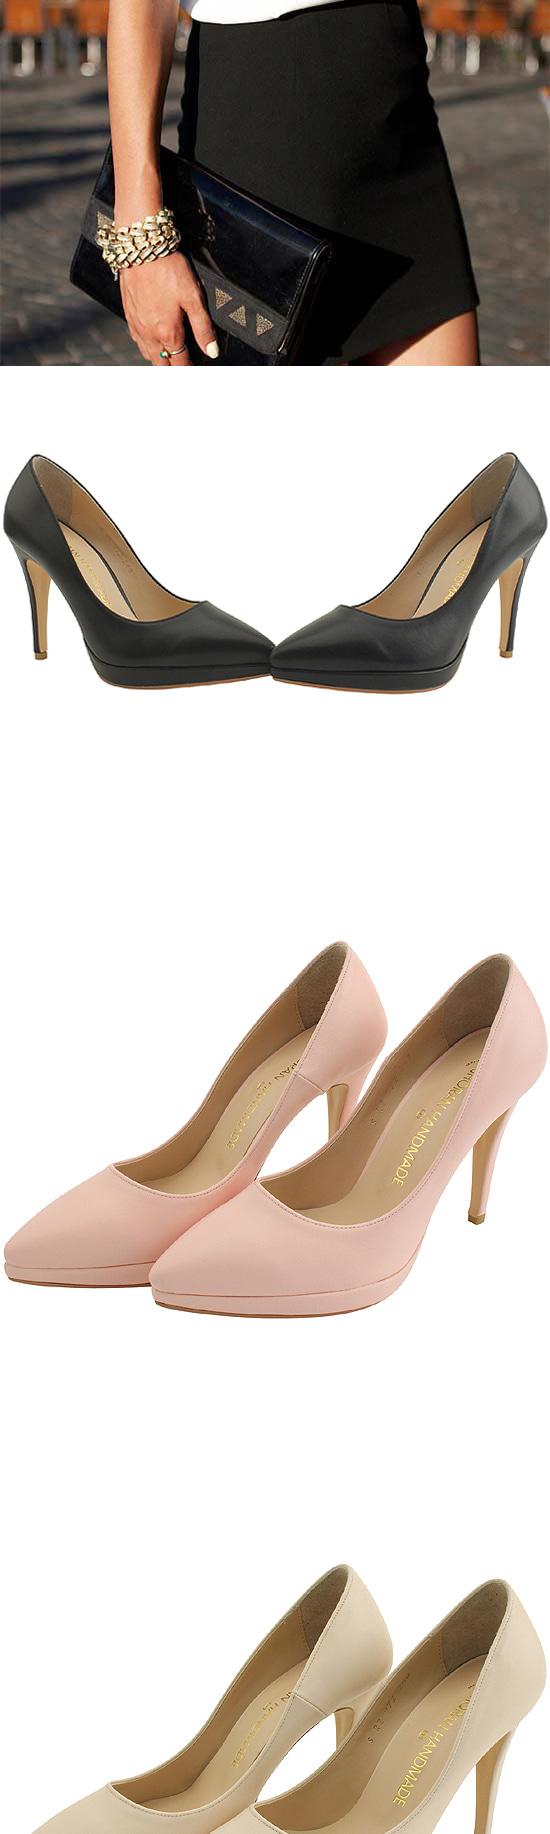 Gaboshi Stiletto Kill Heel Shoes 10cm Pink